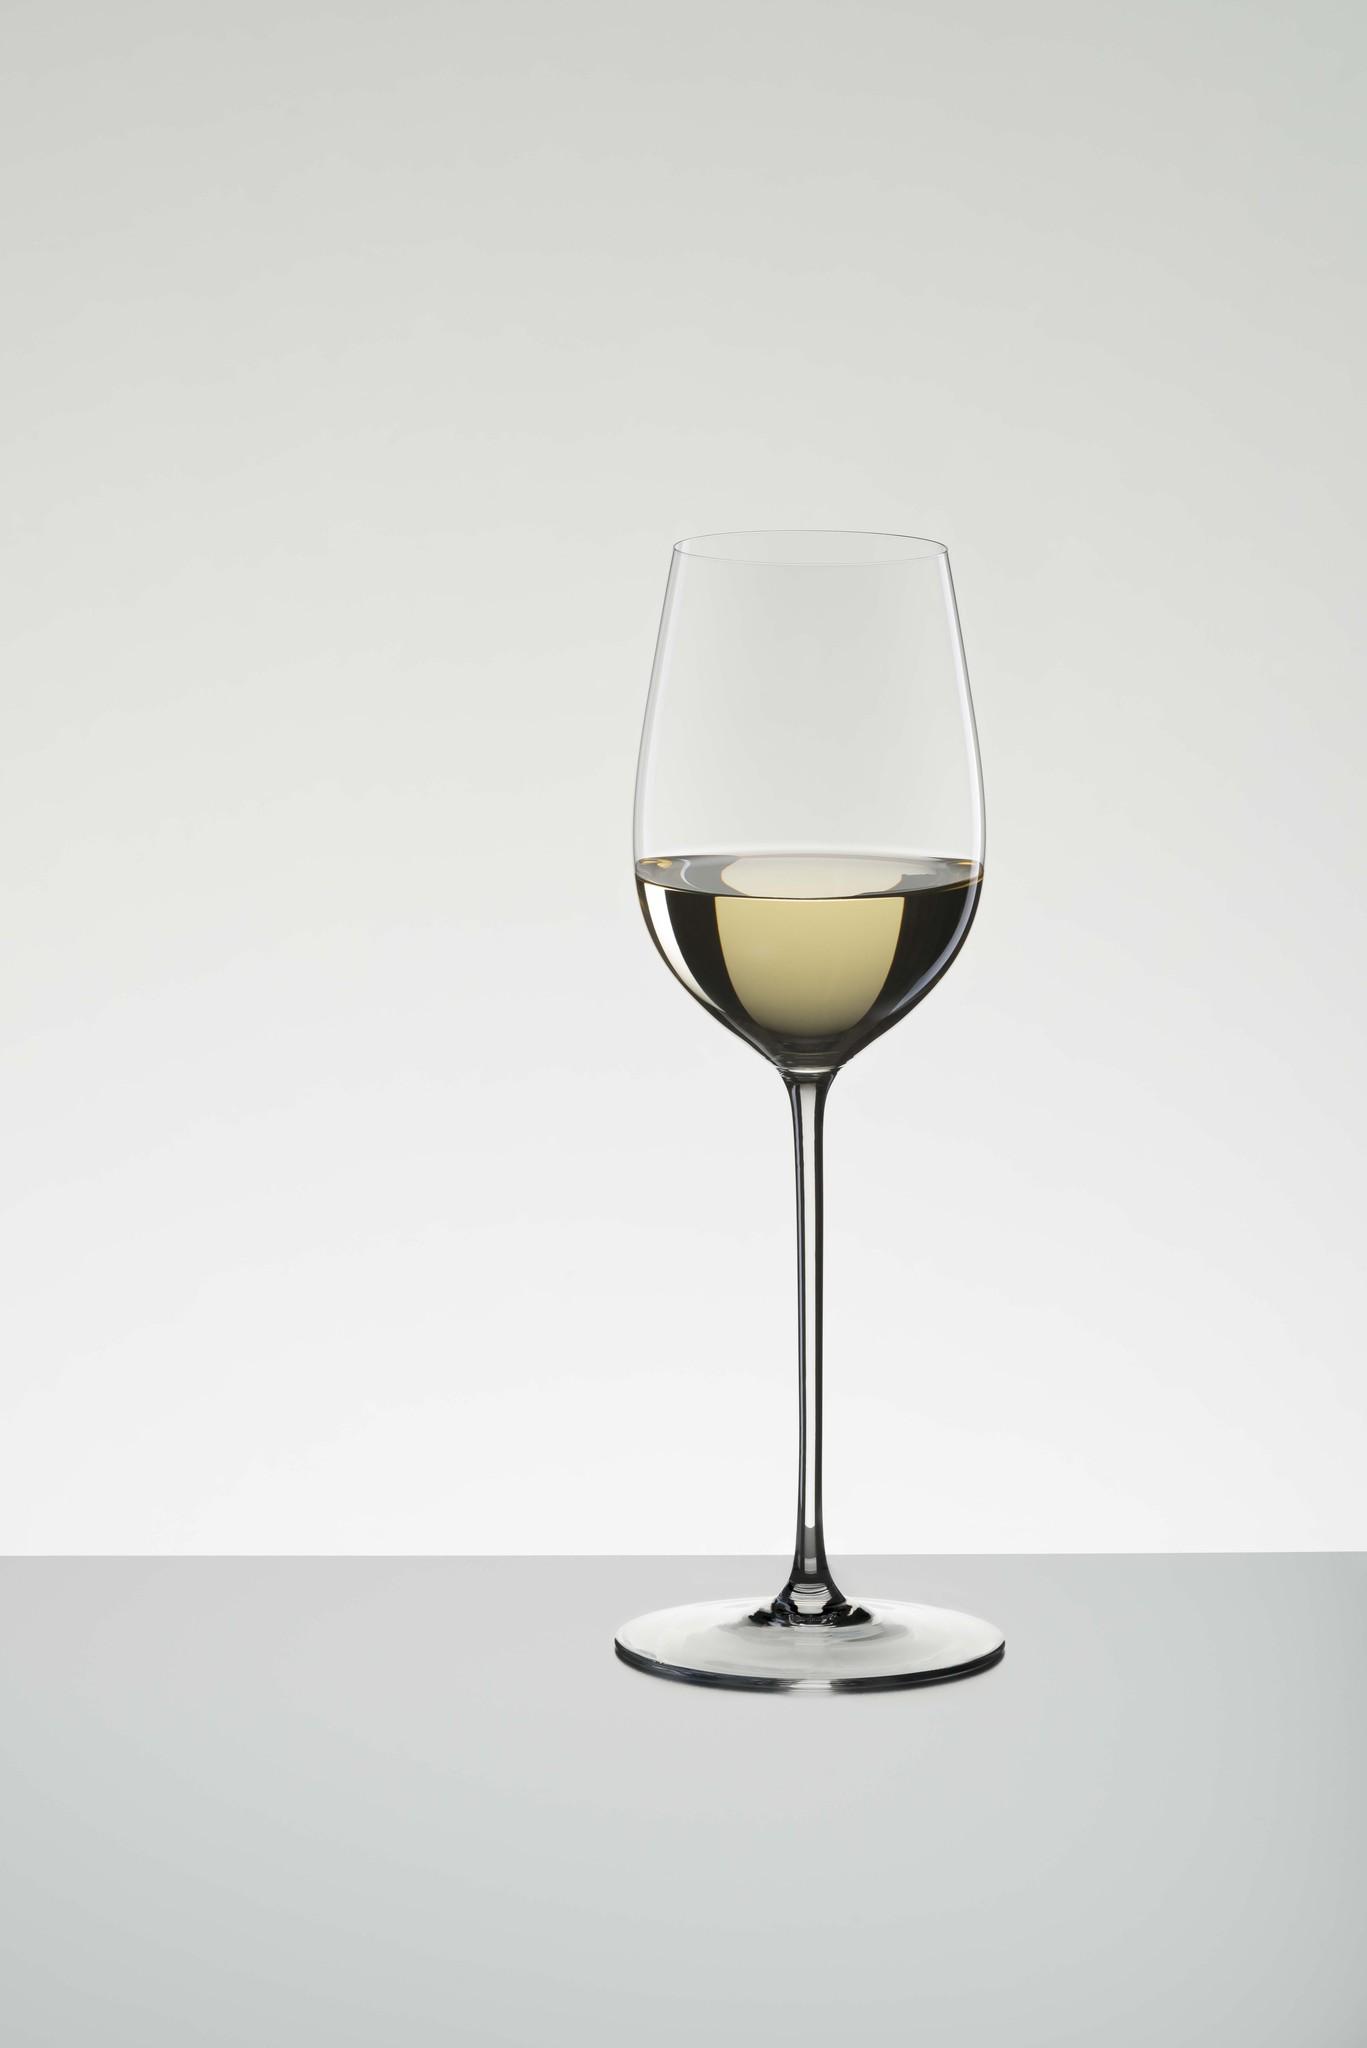 Бокал для белого вина 245мл Riedel Superleggero Viognier/Chardonnay